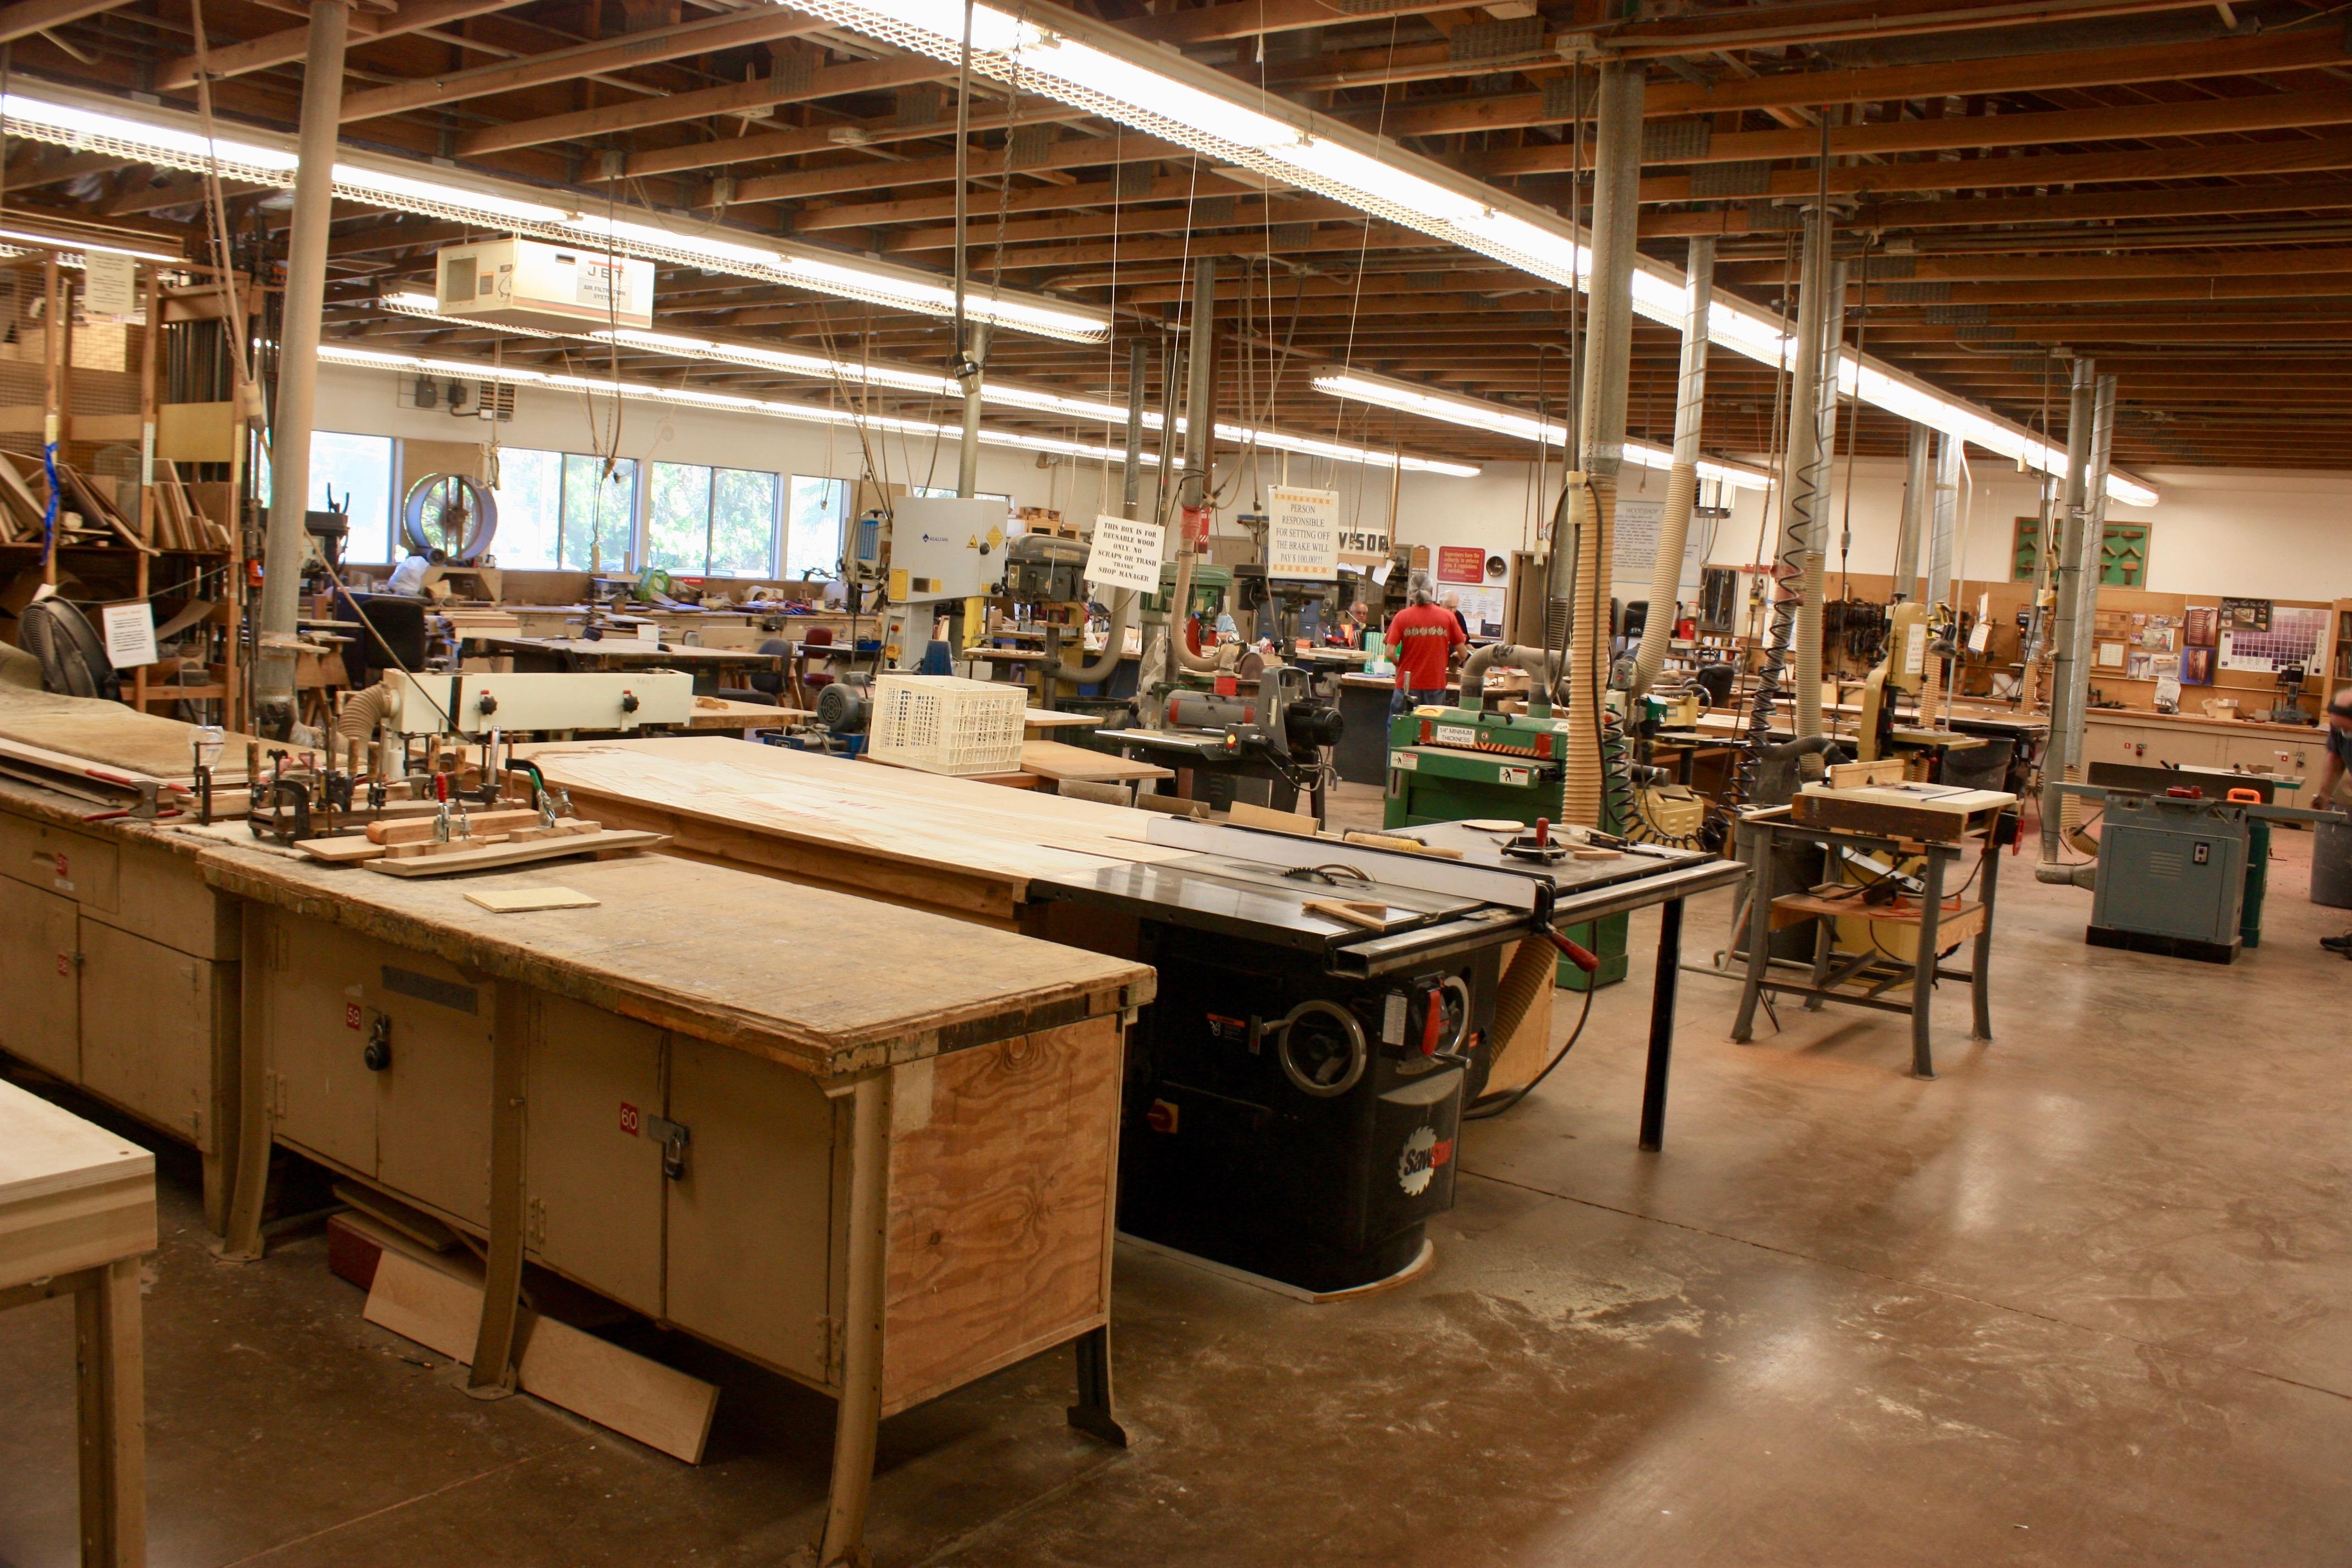 File:Laguna Woods Village woodworking shop.jpg - Wikipedia